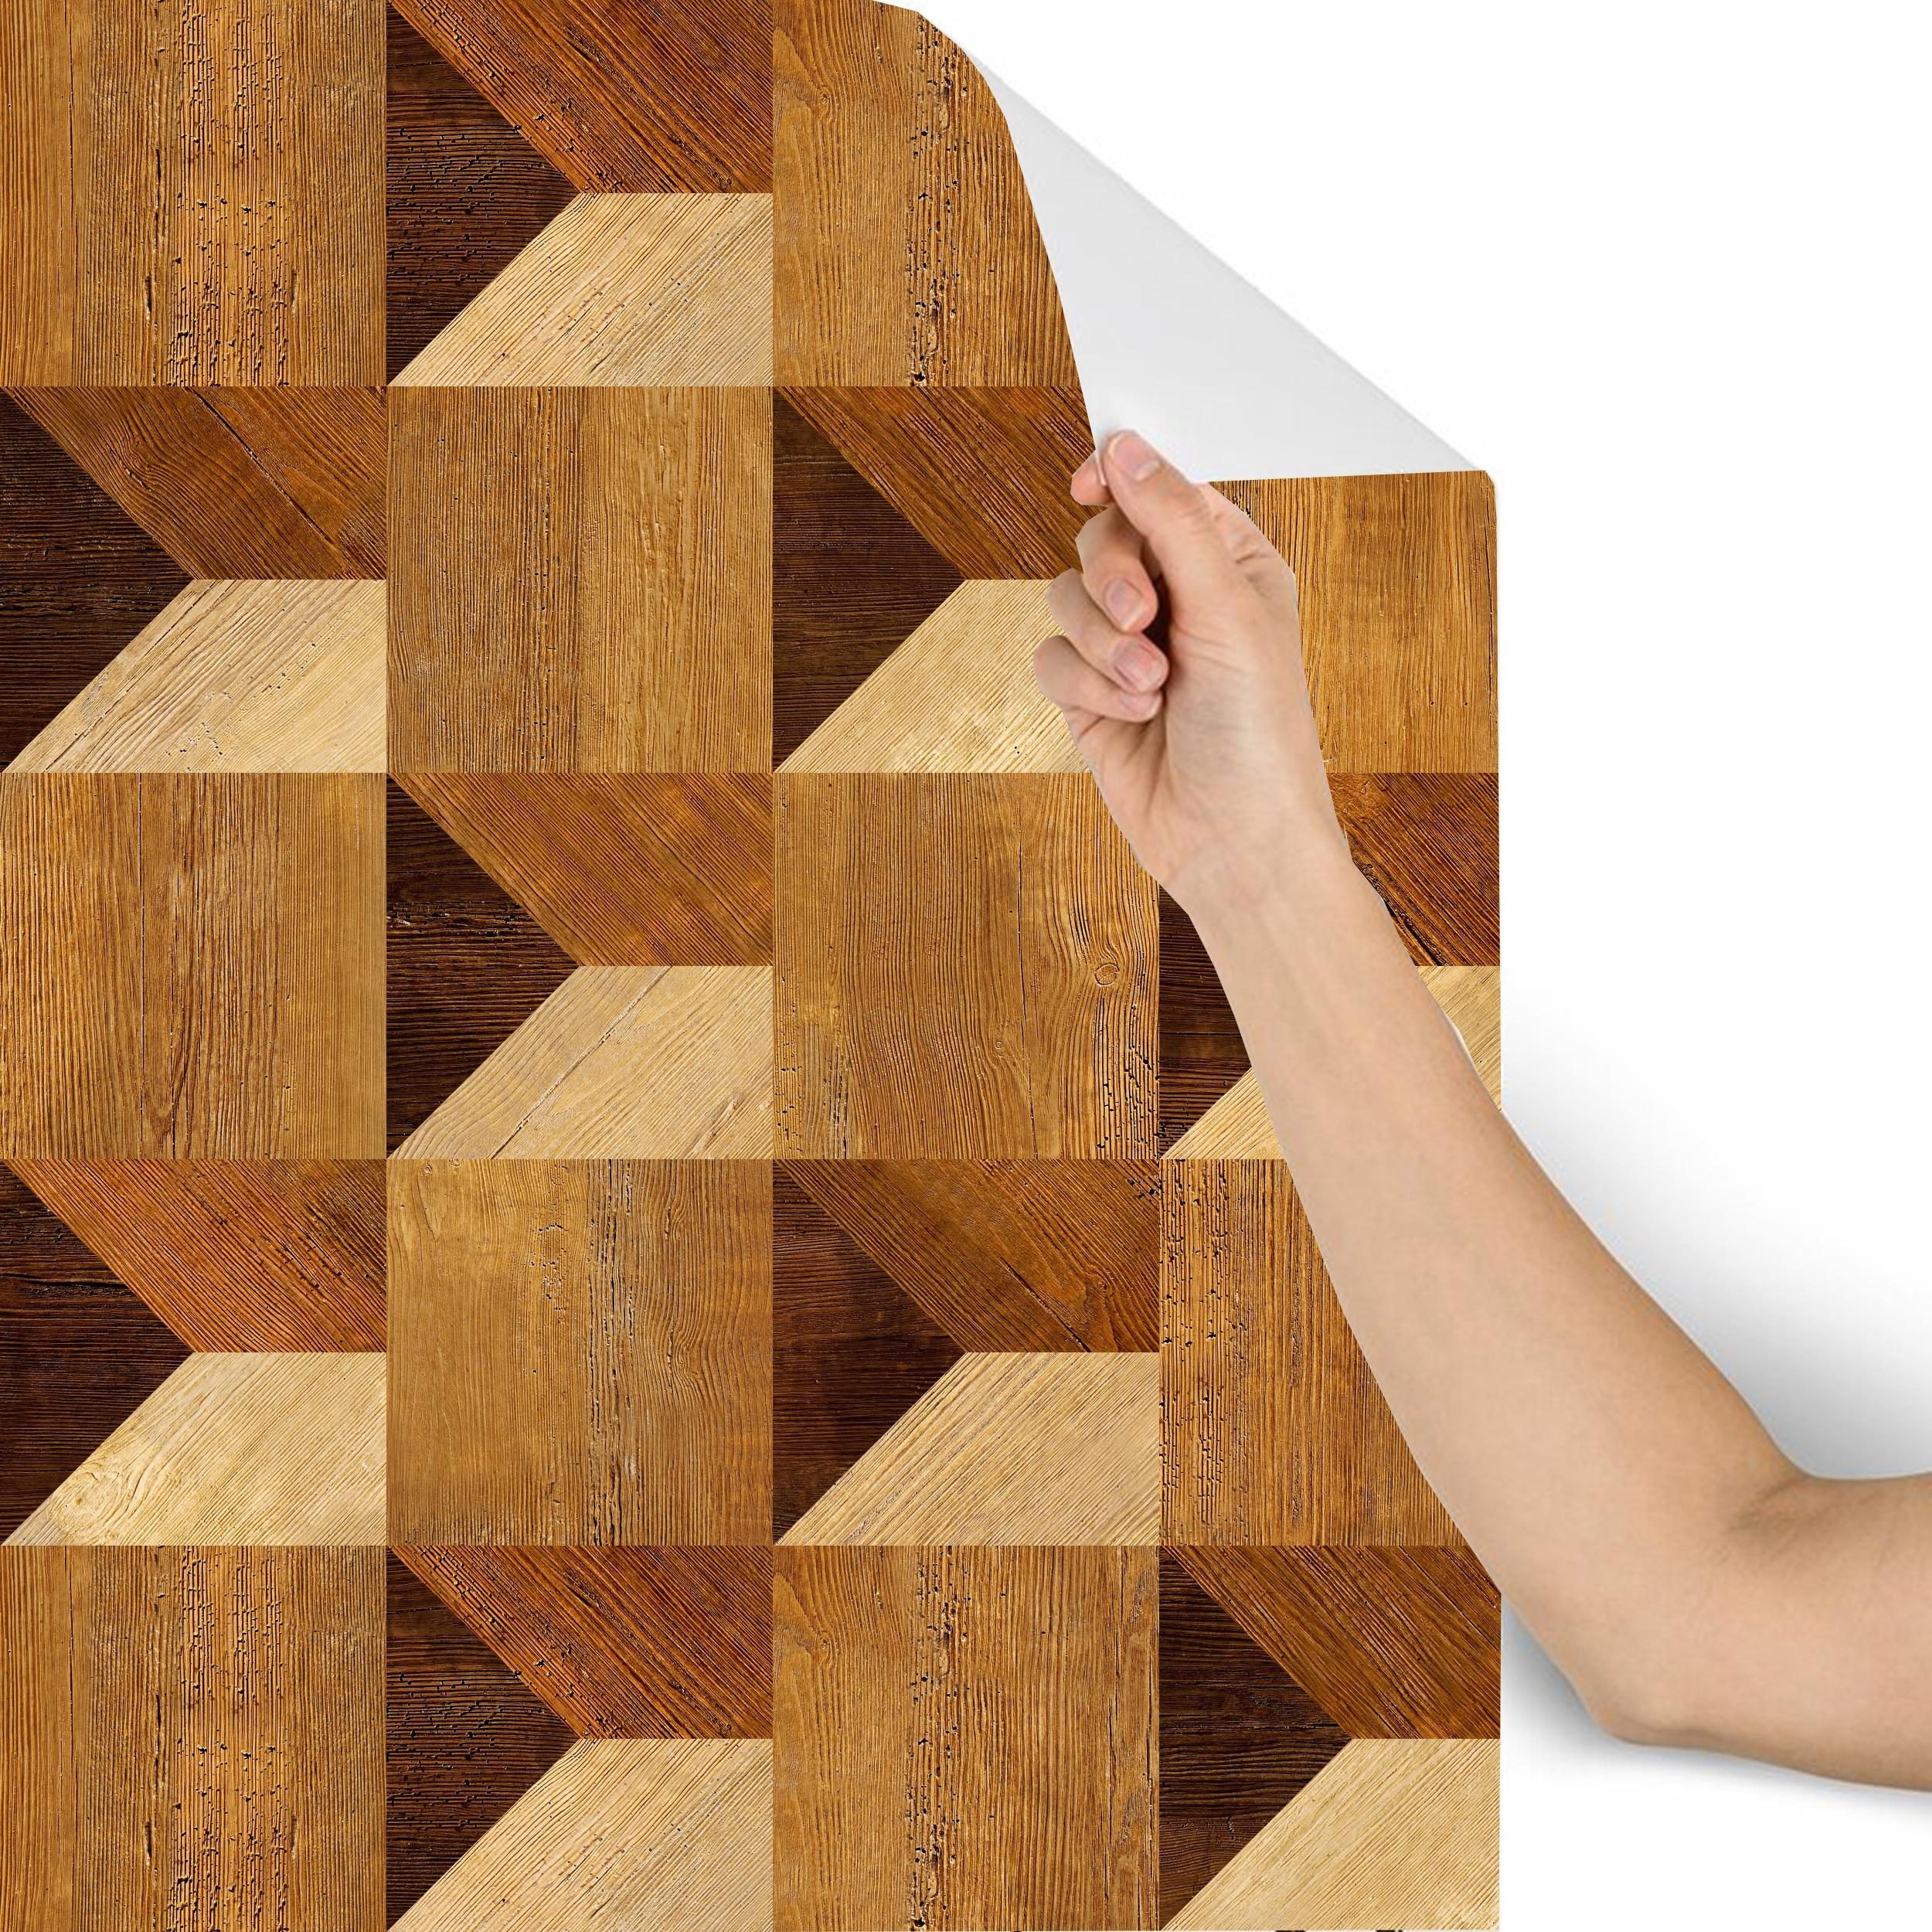 3D Decorative wood paneling Removable Wallpaper